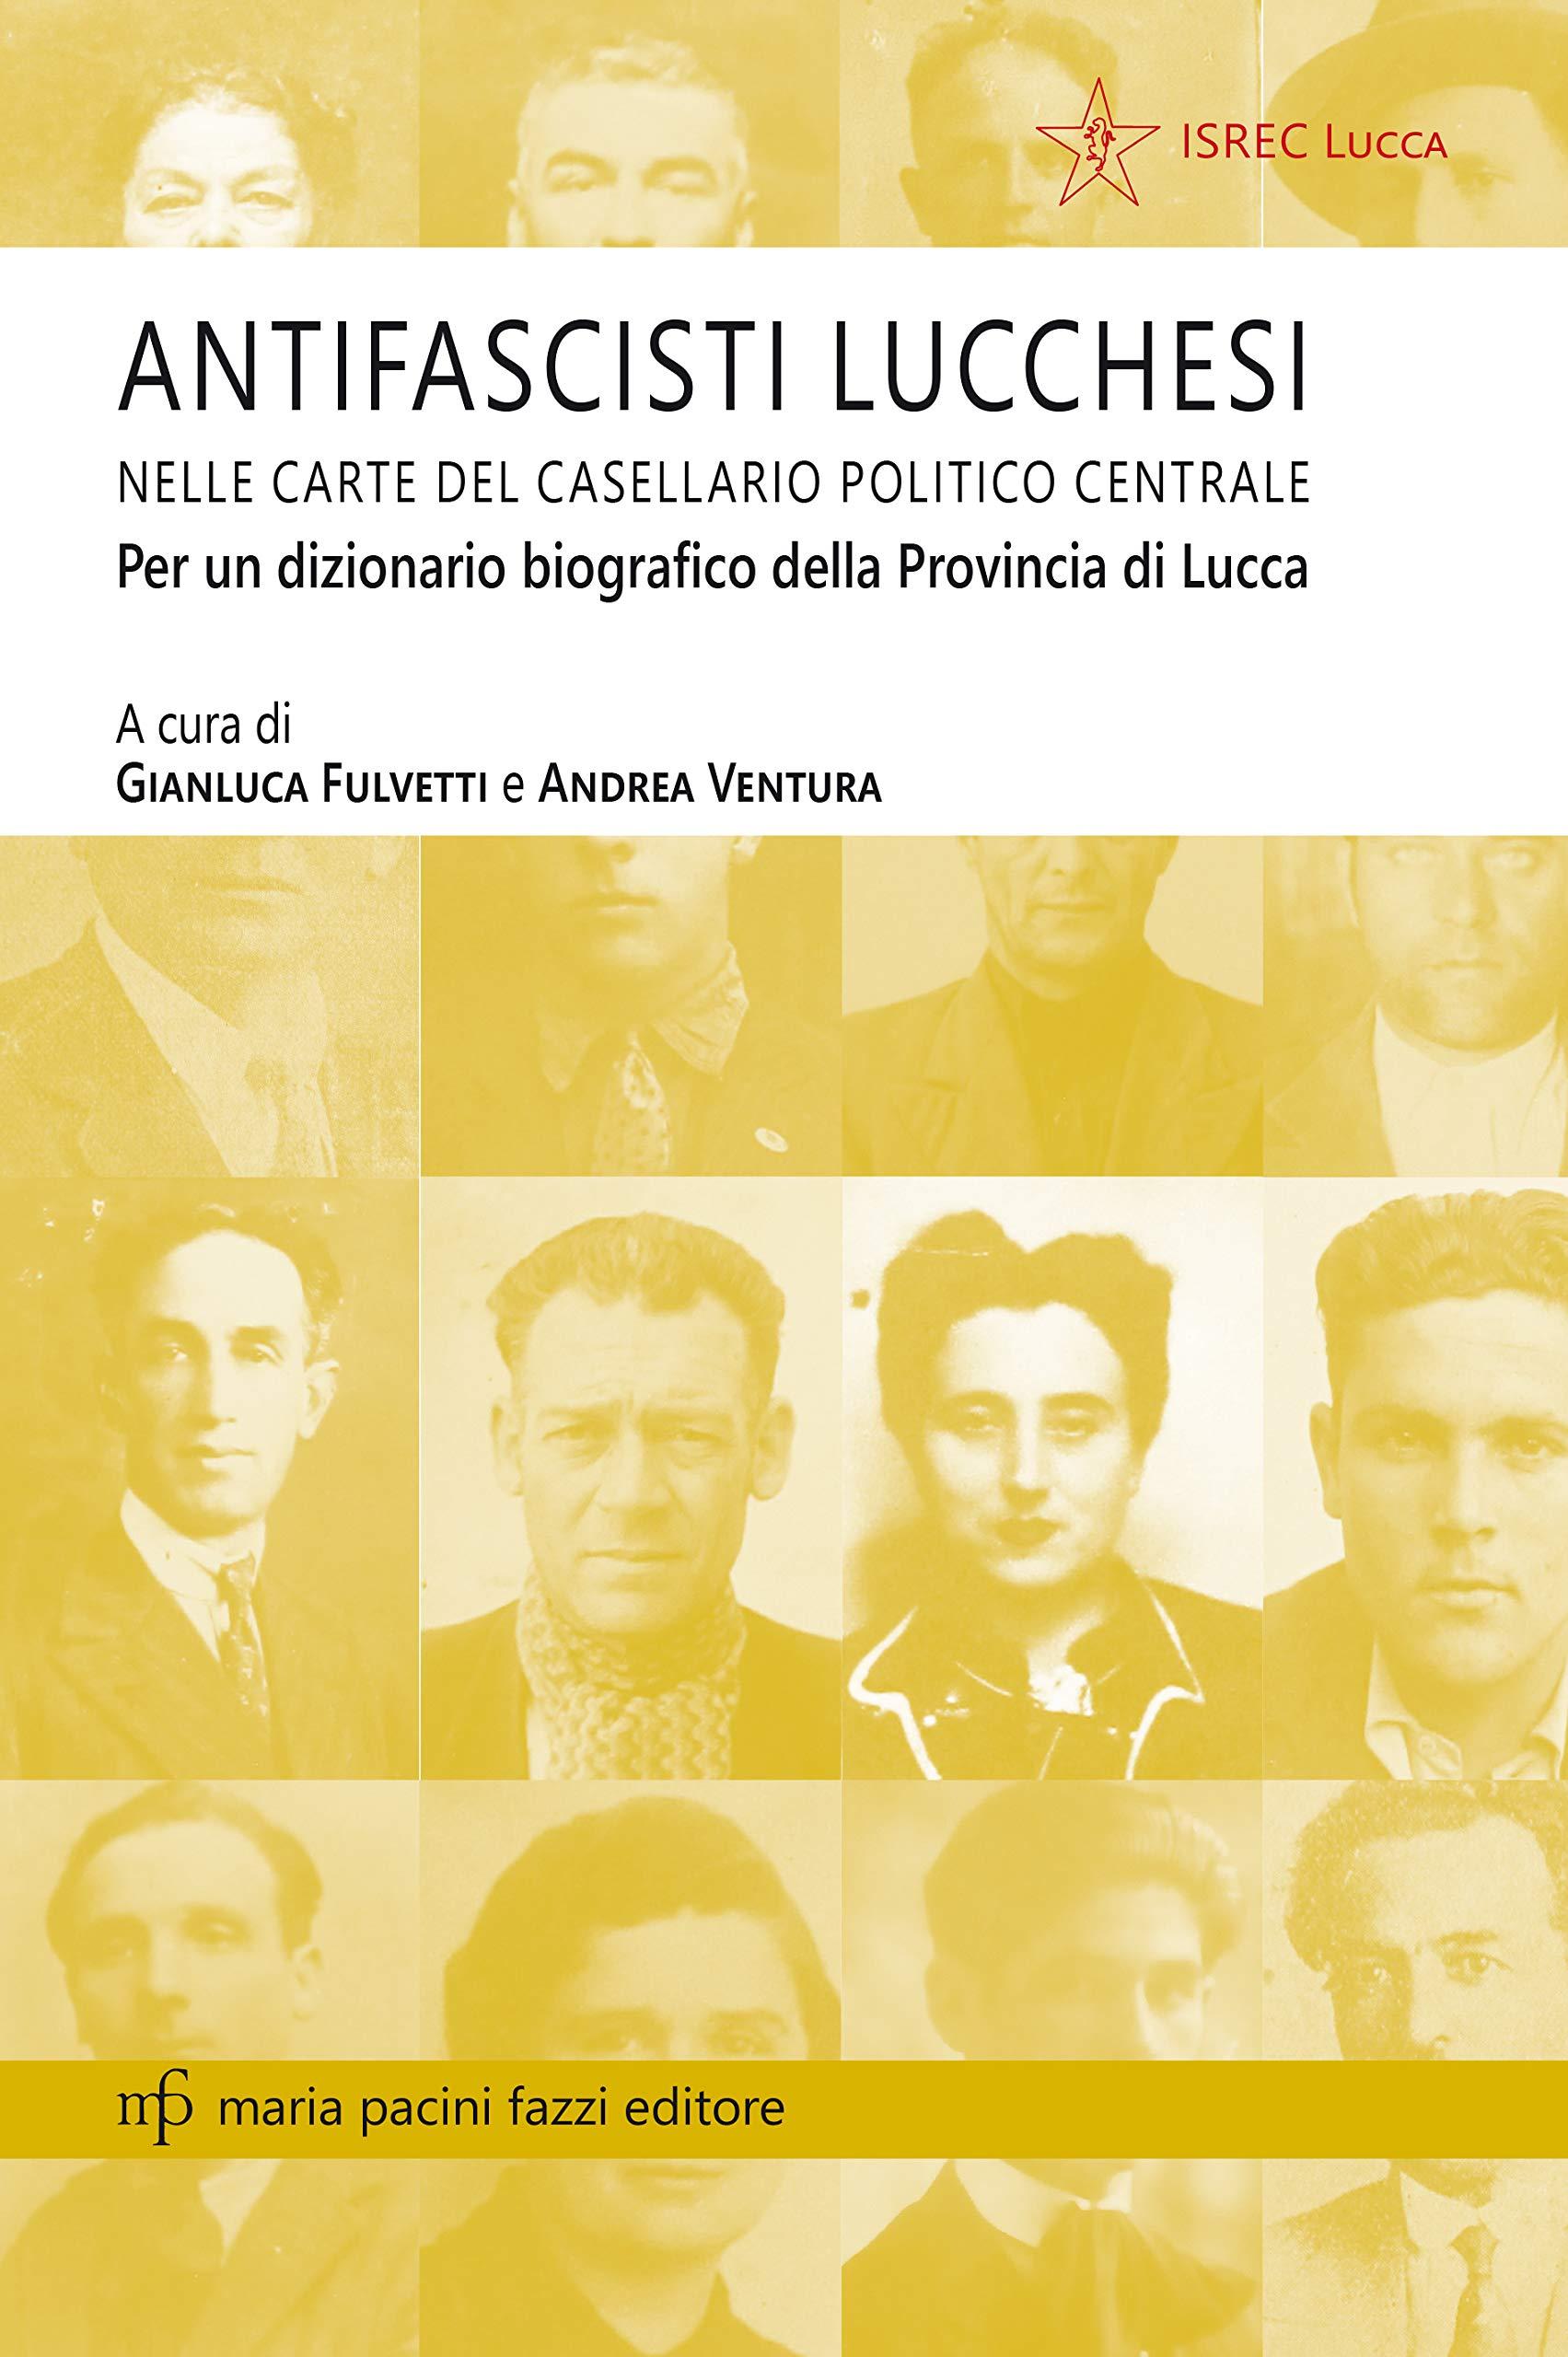 antifascisti-lucchesi_fulvetti_ventura_ISRECLU